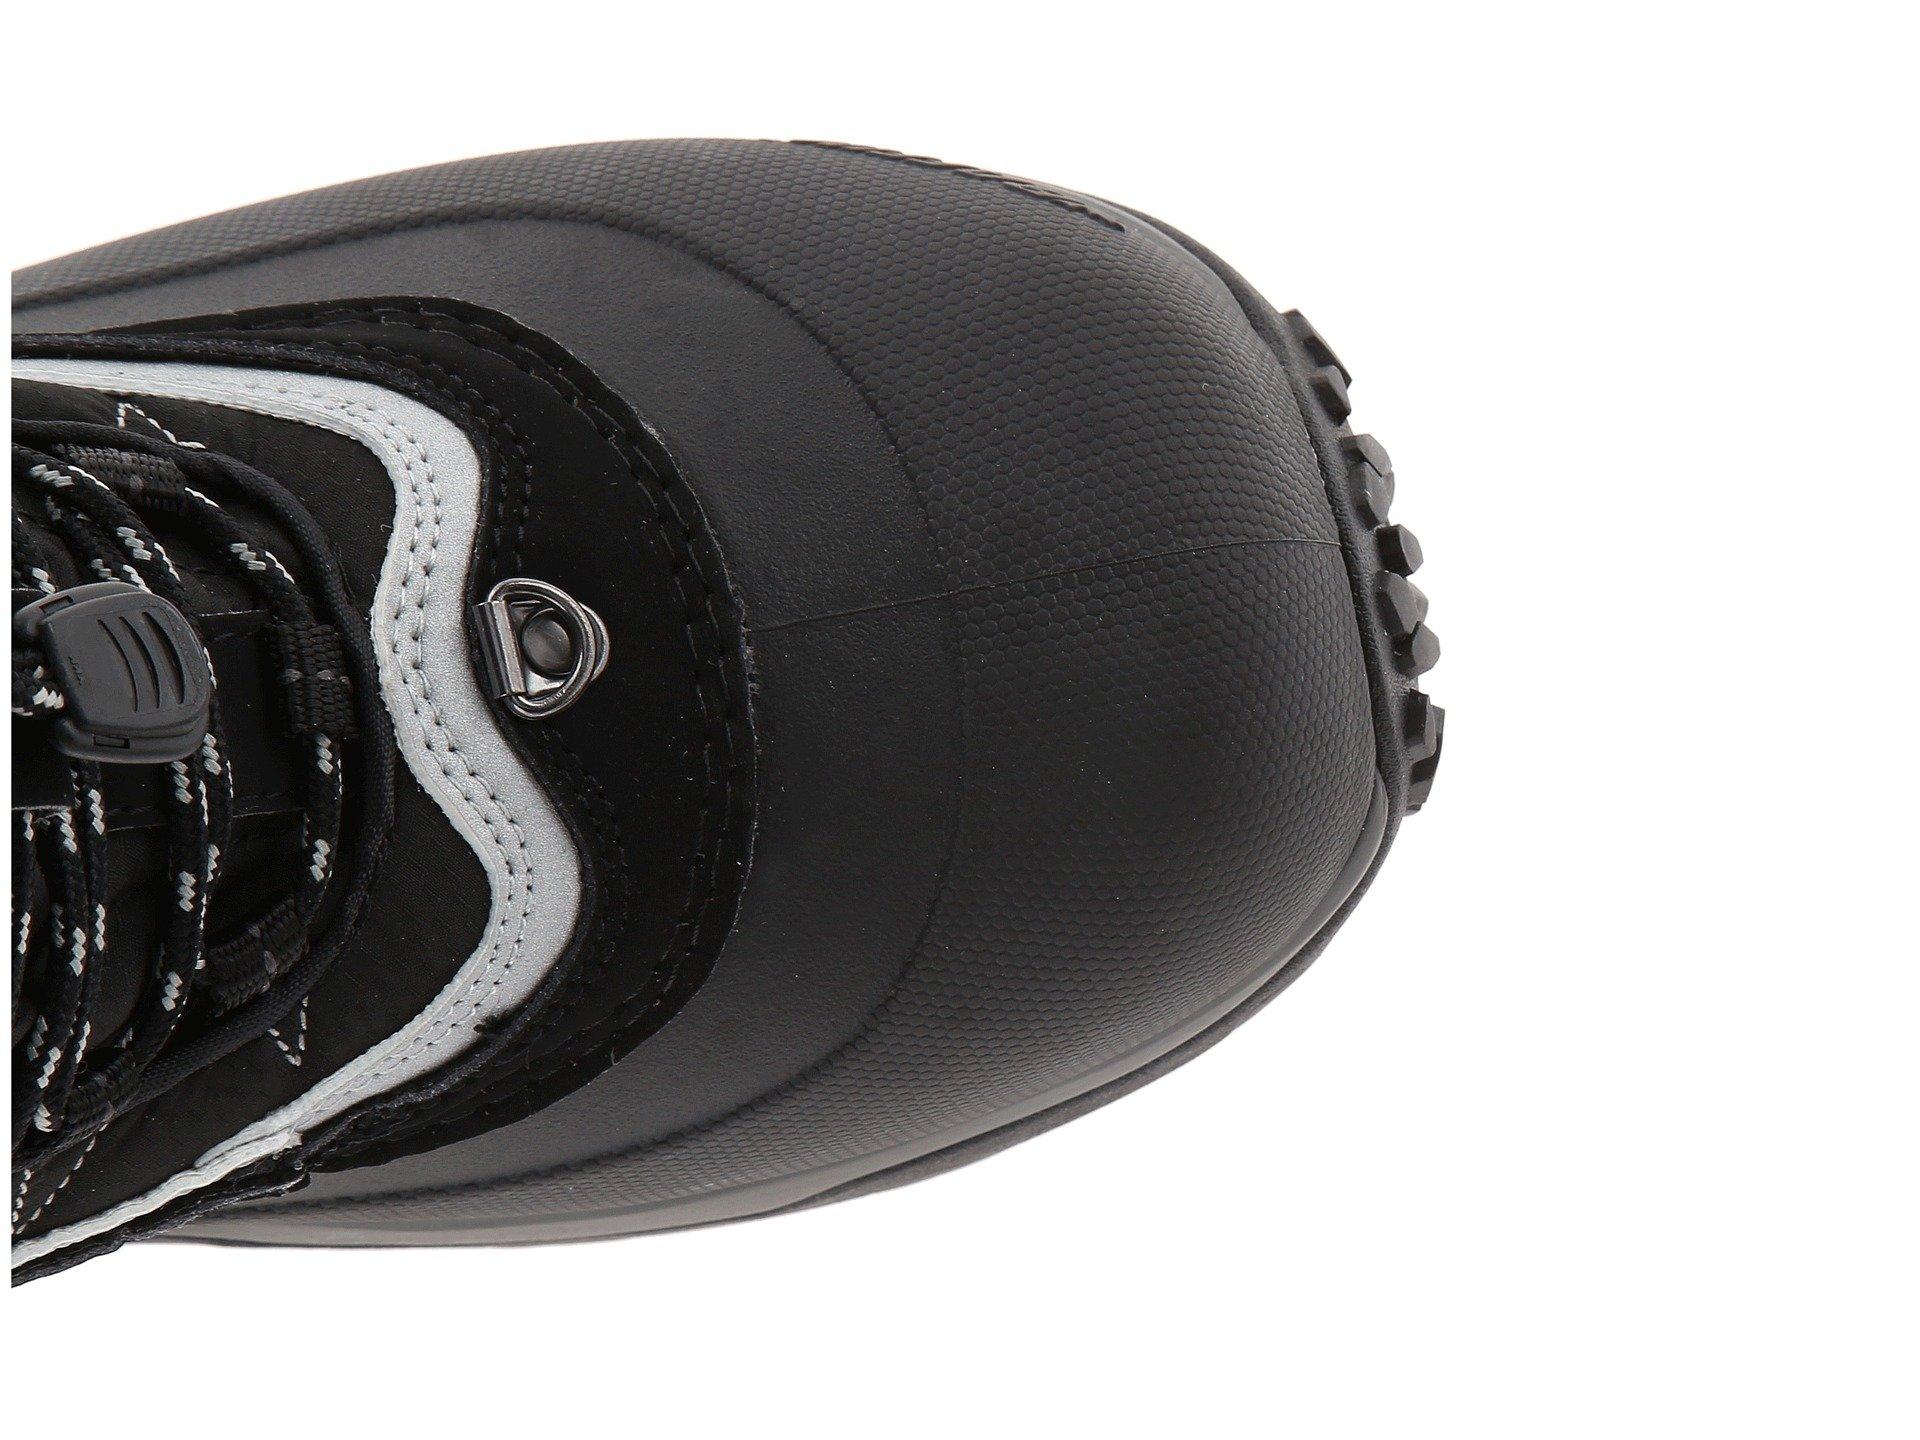 Baffin Black Black Revelstoke Black Revelstoke Baffin Revelstoke Black Baffin Revelstoke Revelstoke Baffin Revelstoke Baffin Baffin Black Black wAqfWTxt5U